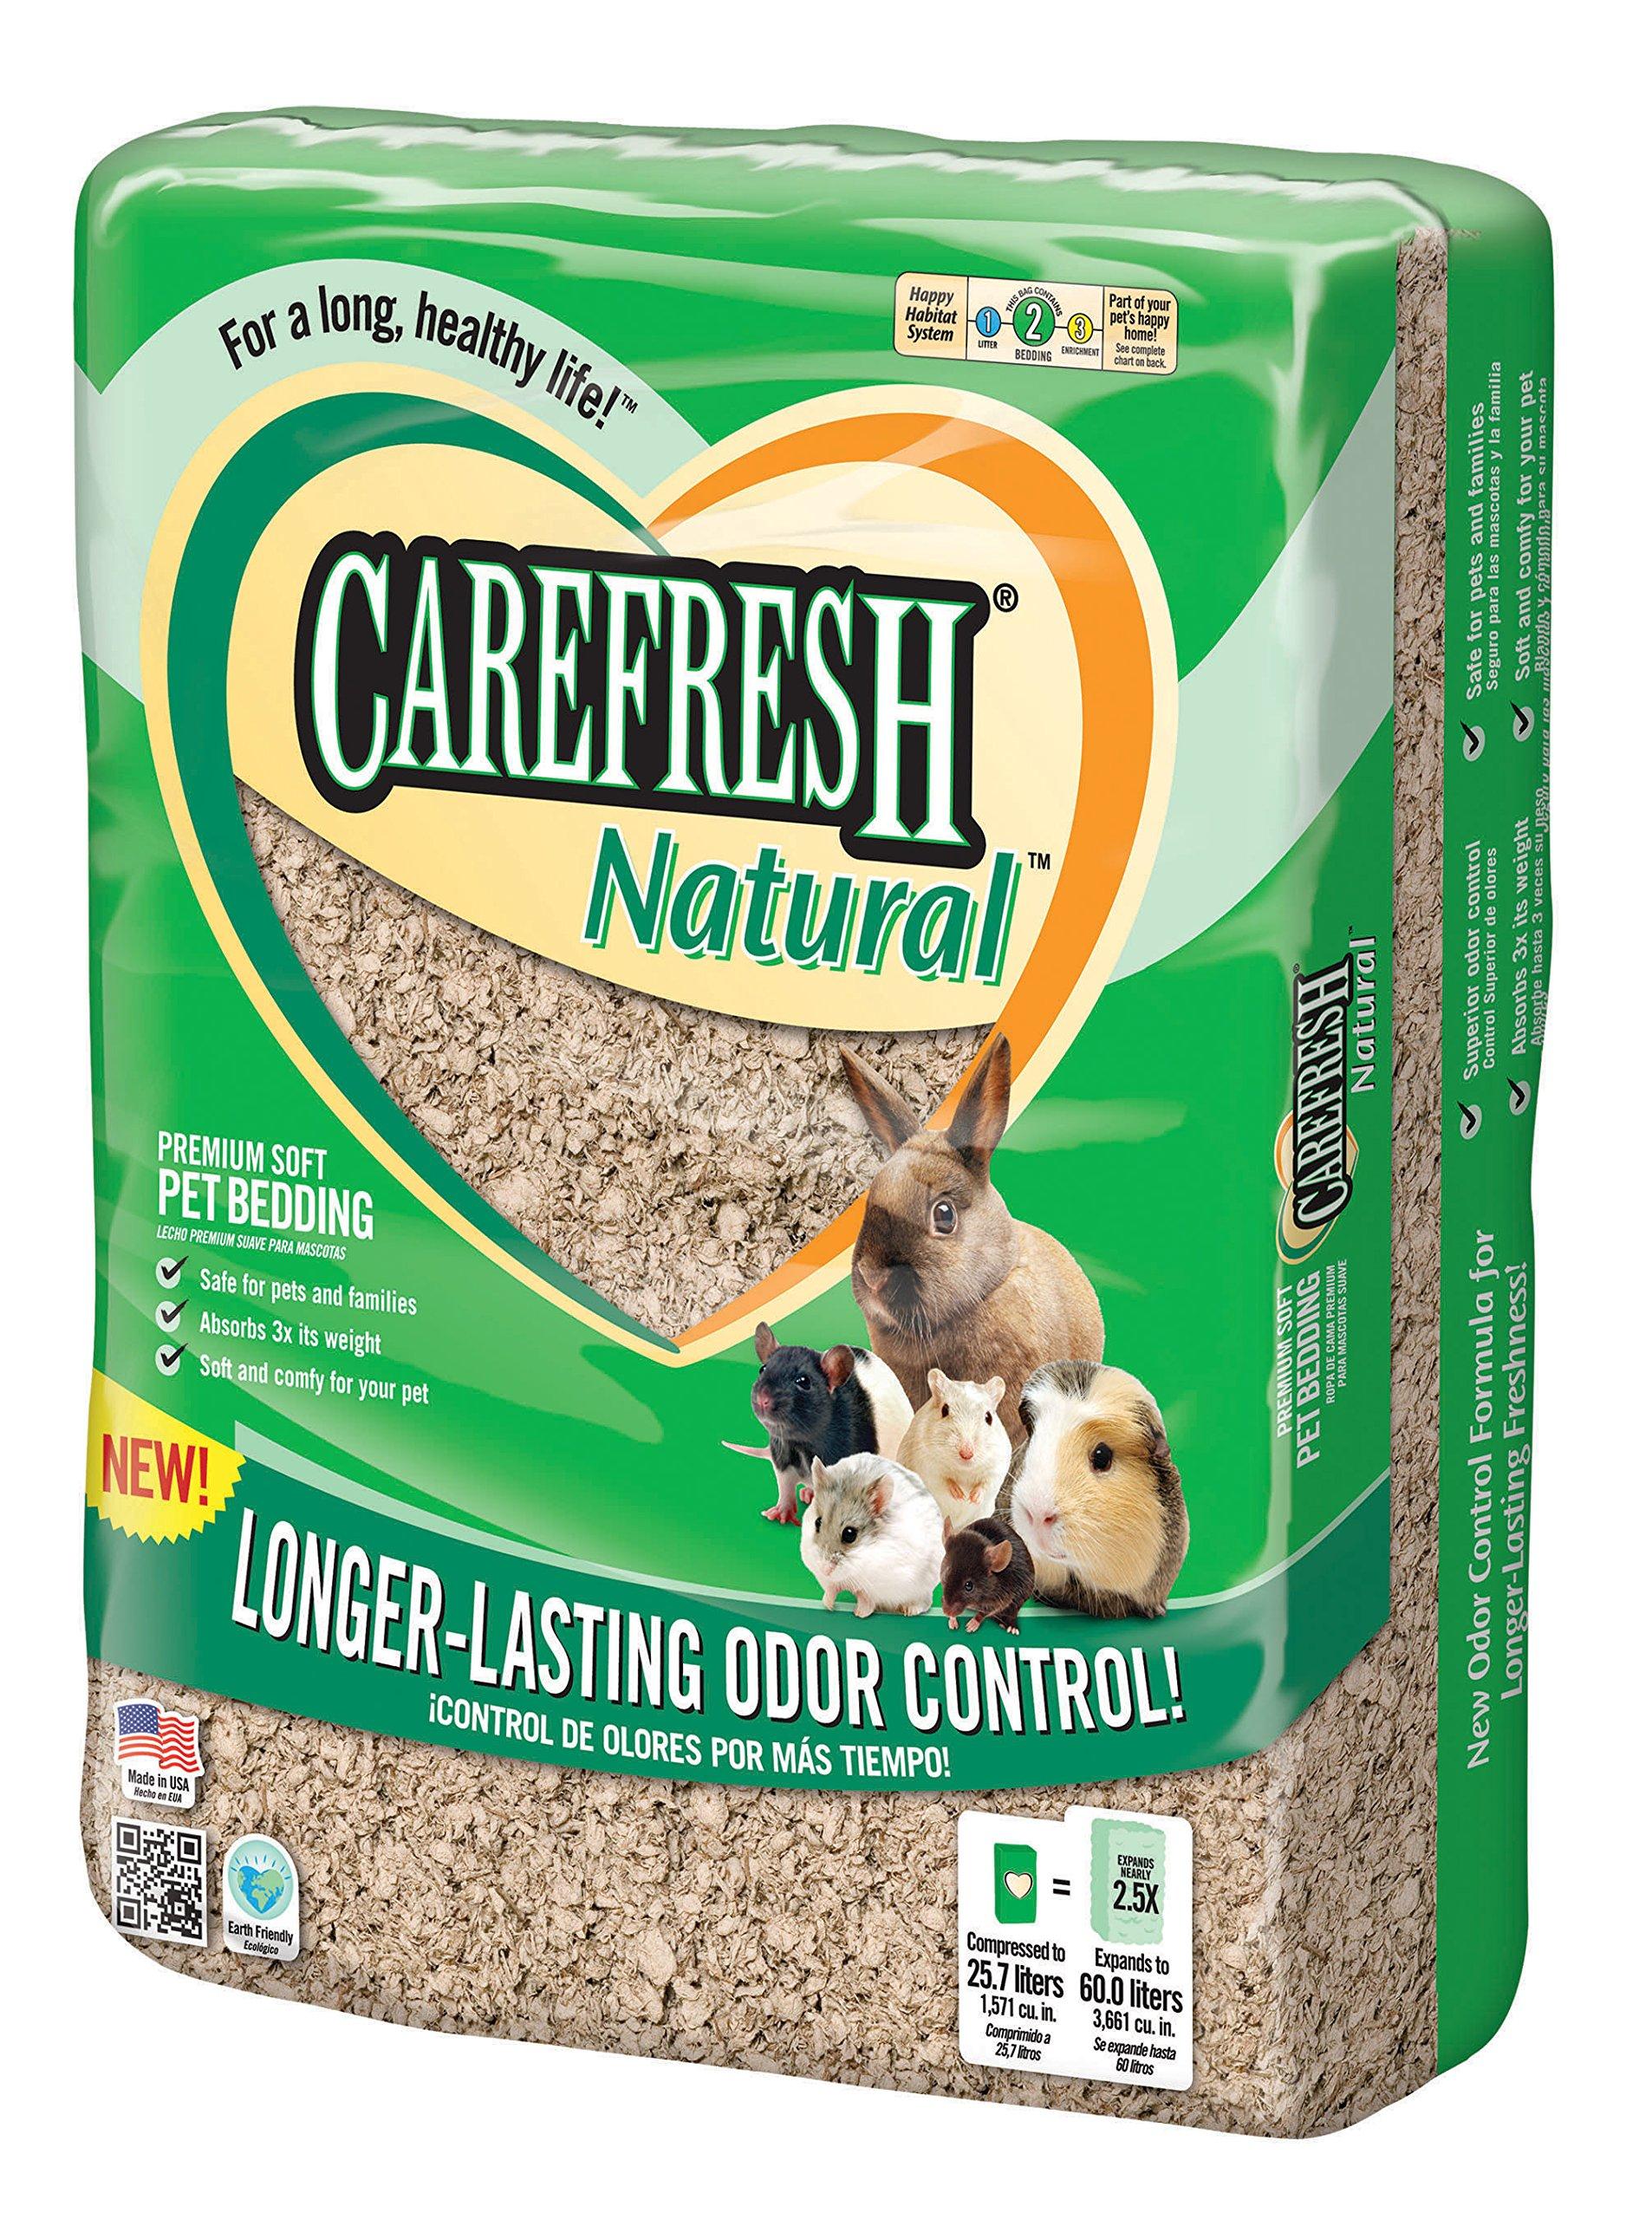 Carefresh Natural Premium Soft Pet Bedding, 60- Liter by Monster Pets